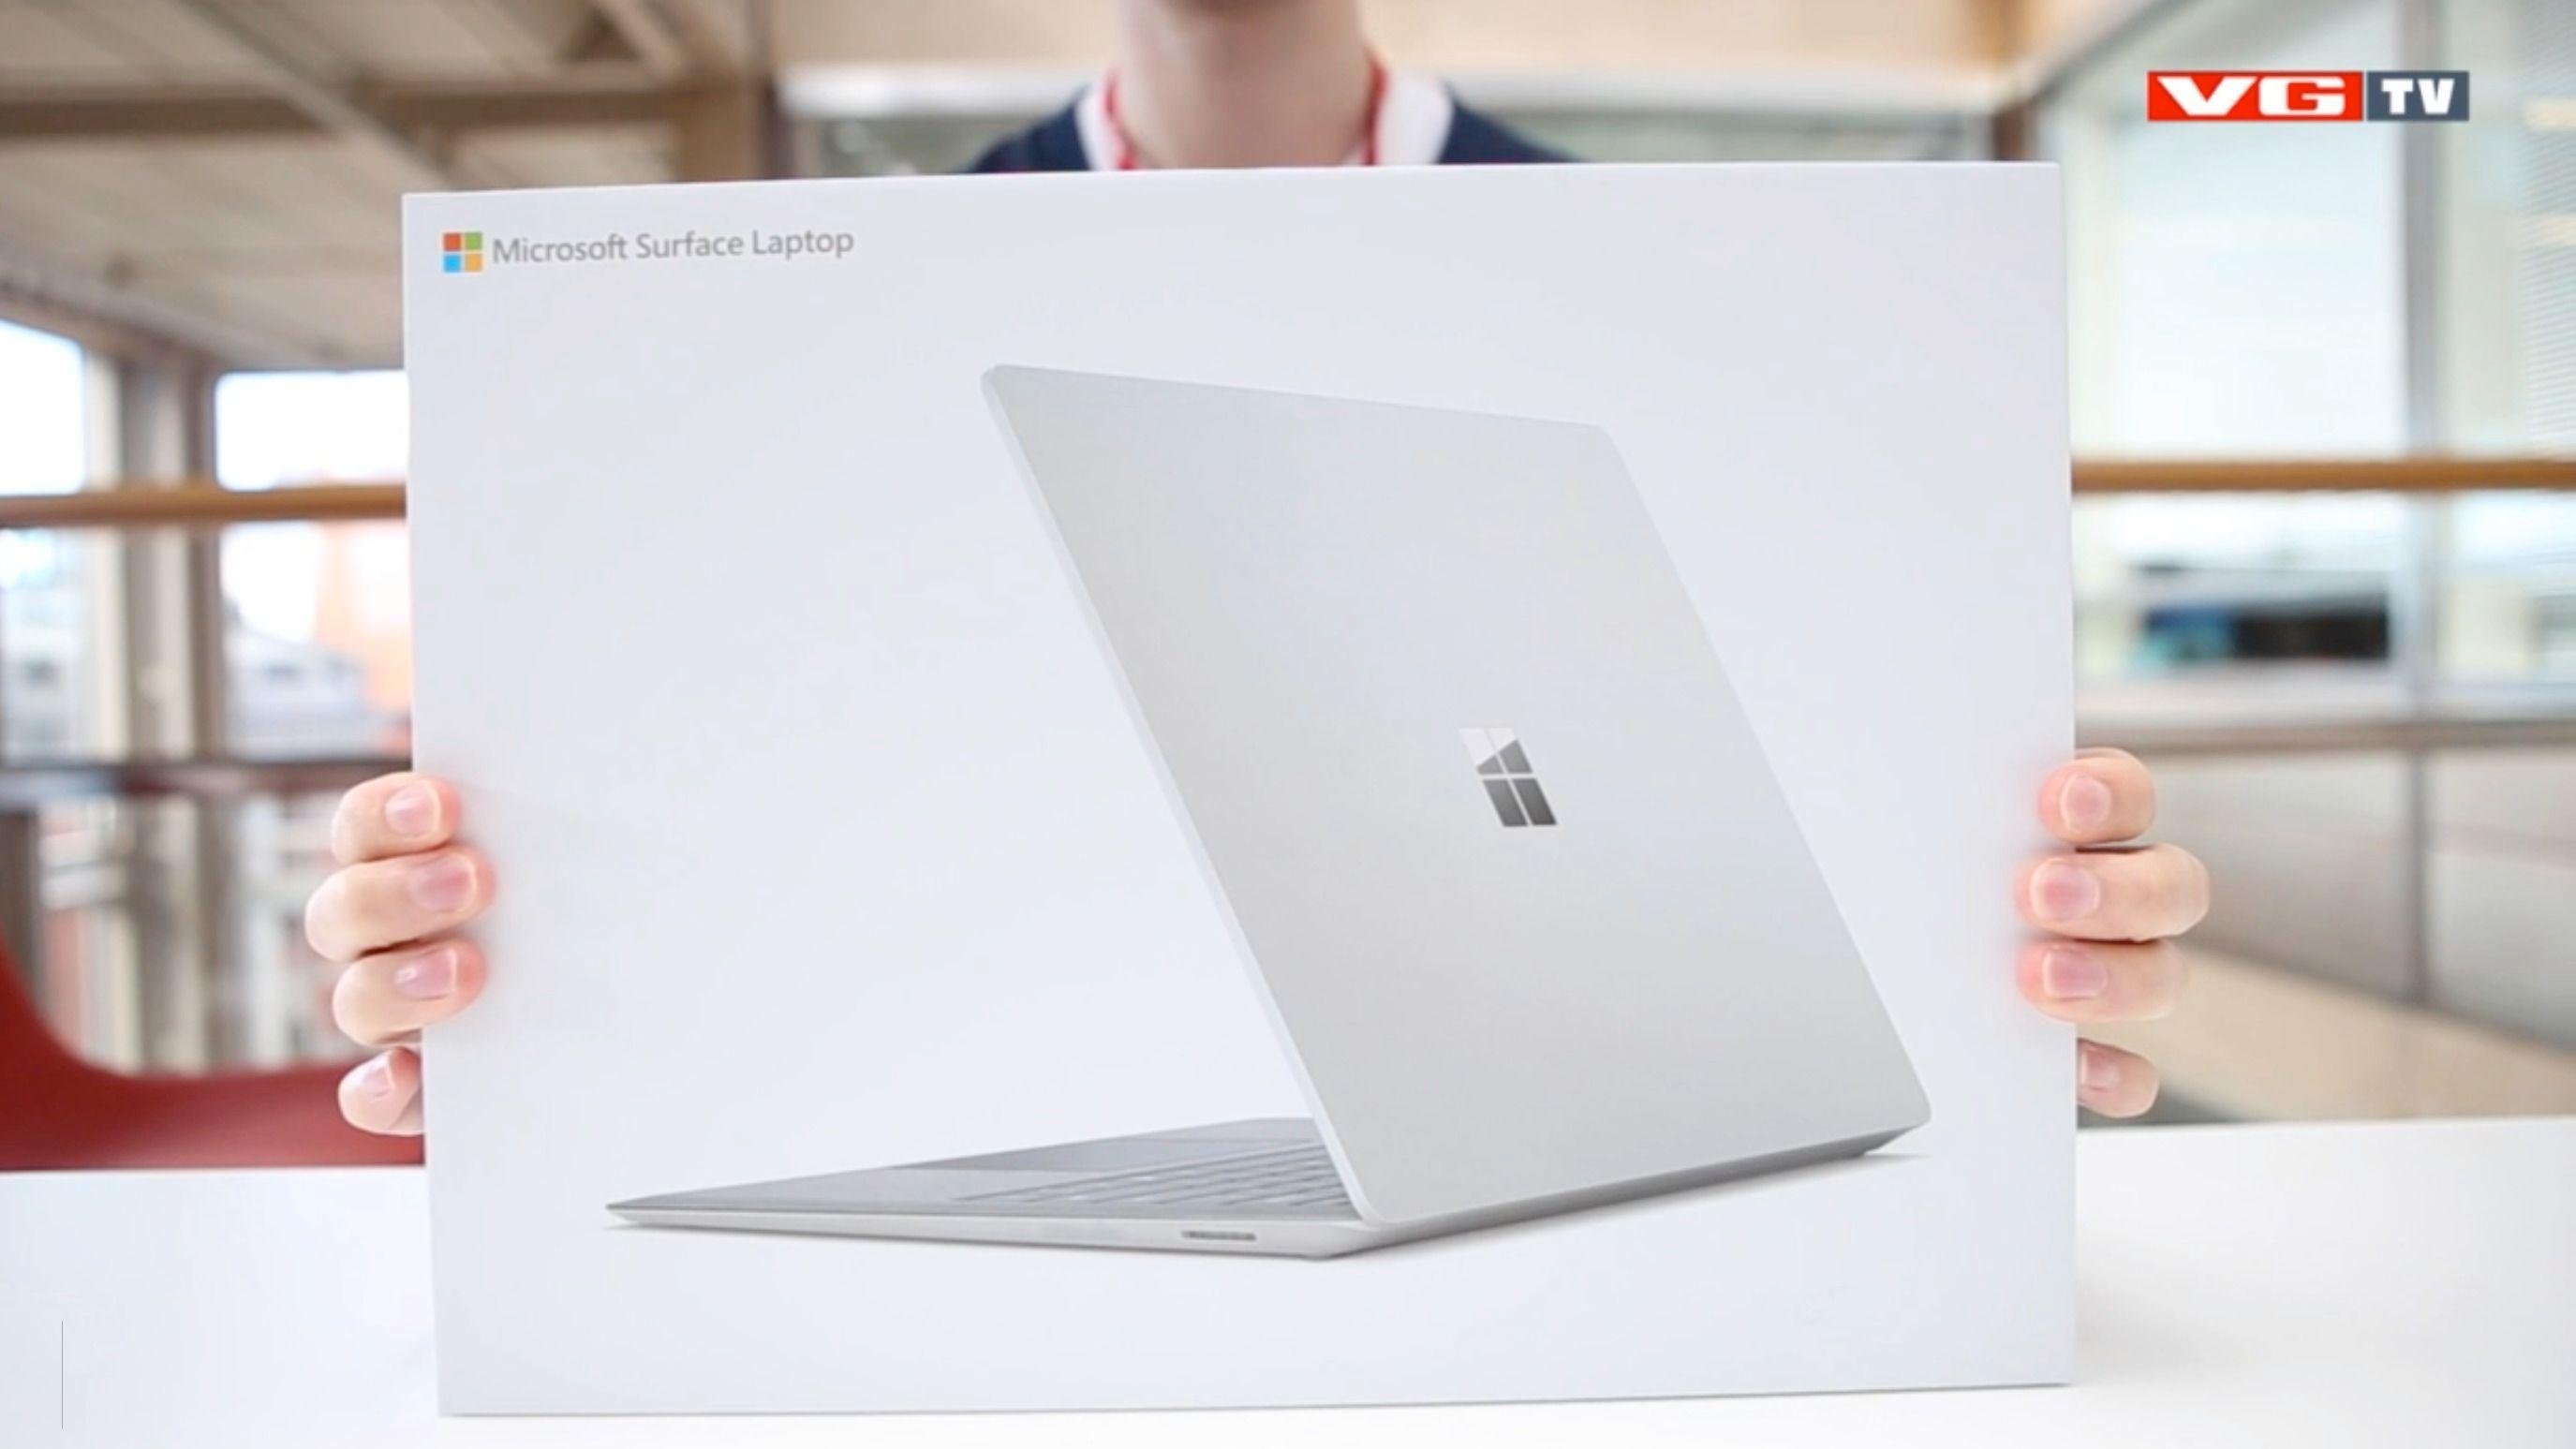 Video: Microsoft Surface Laptop